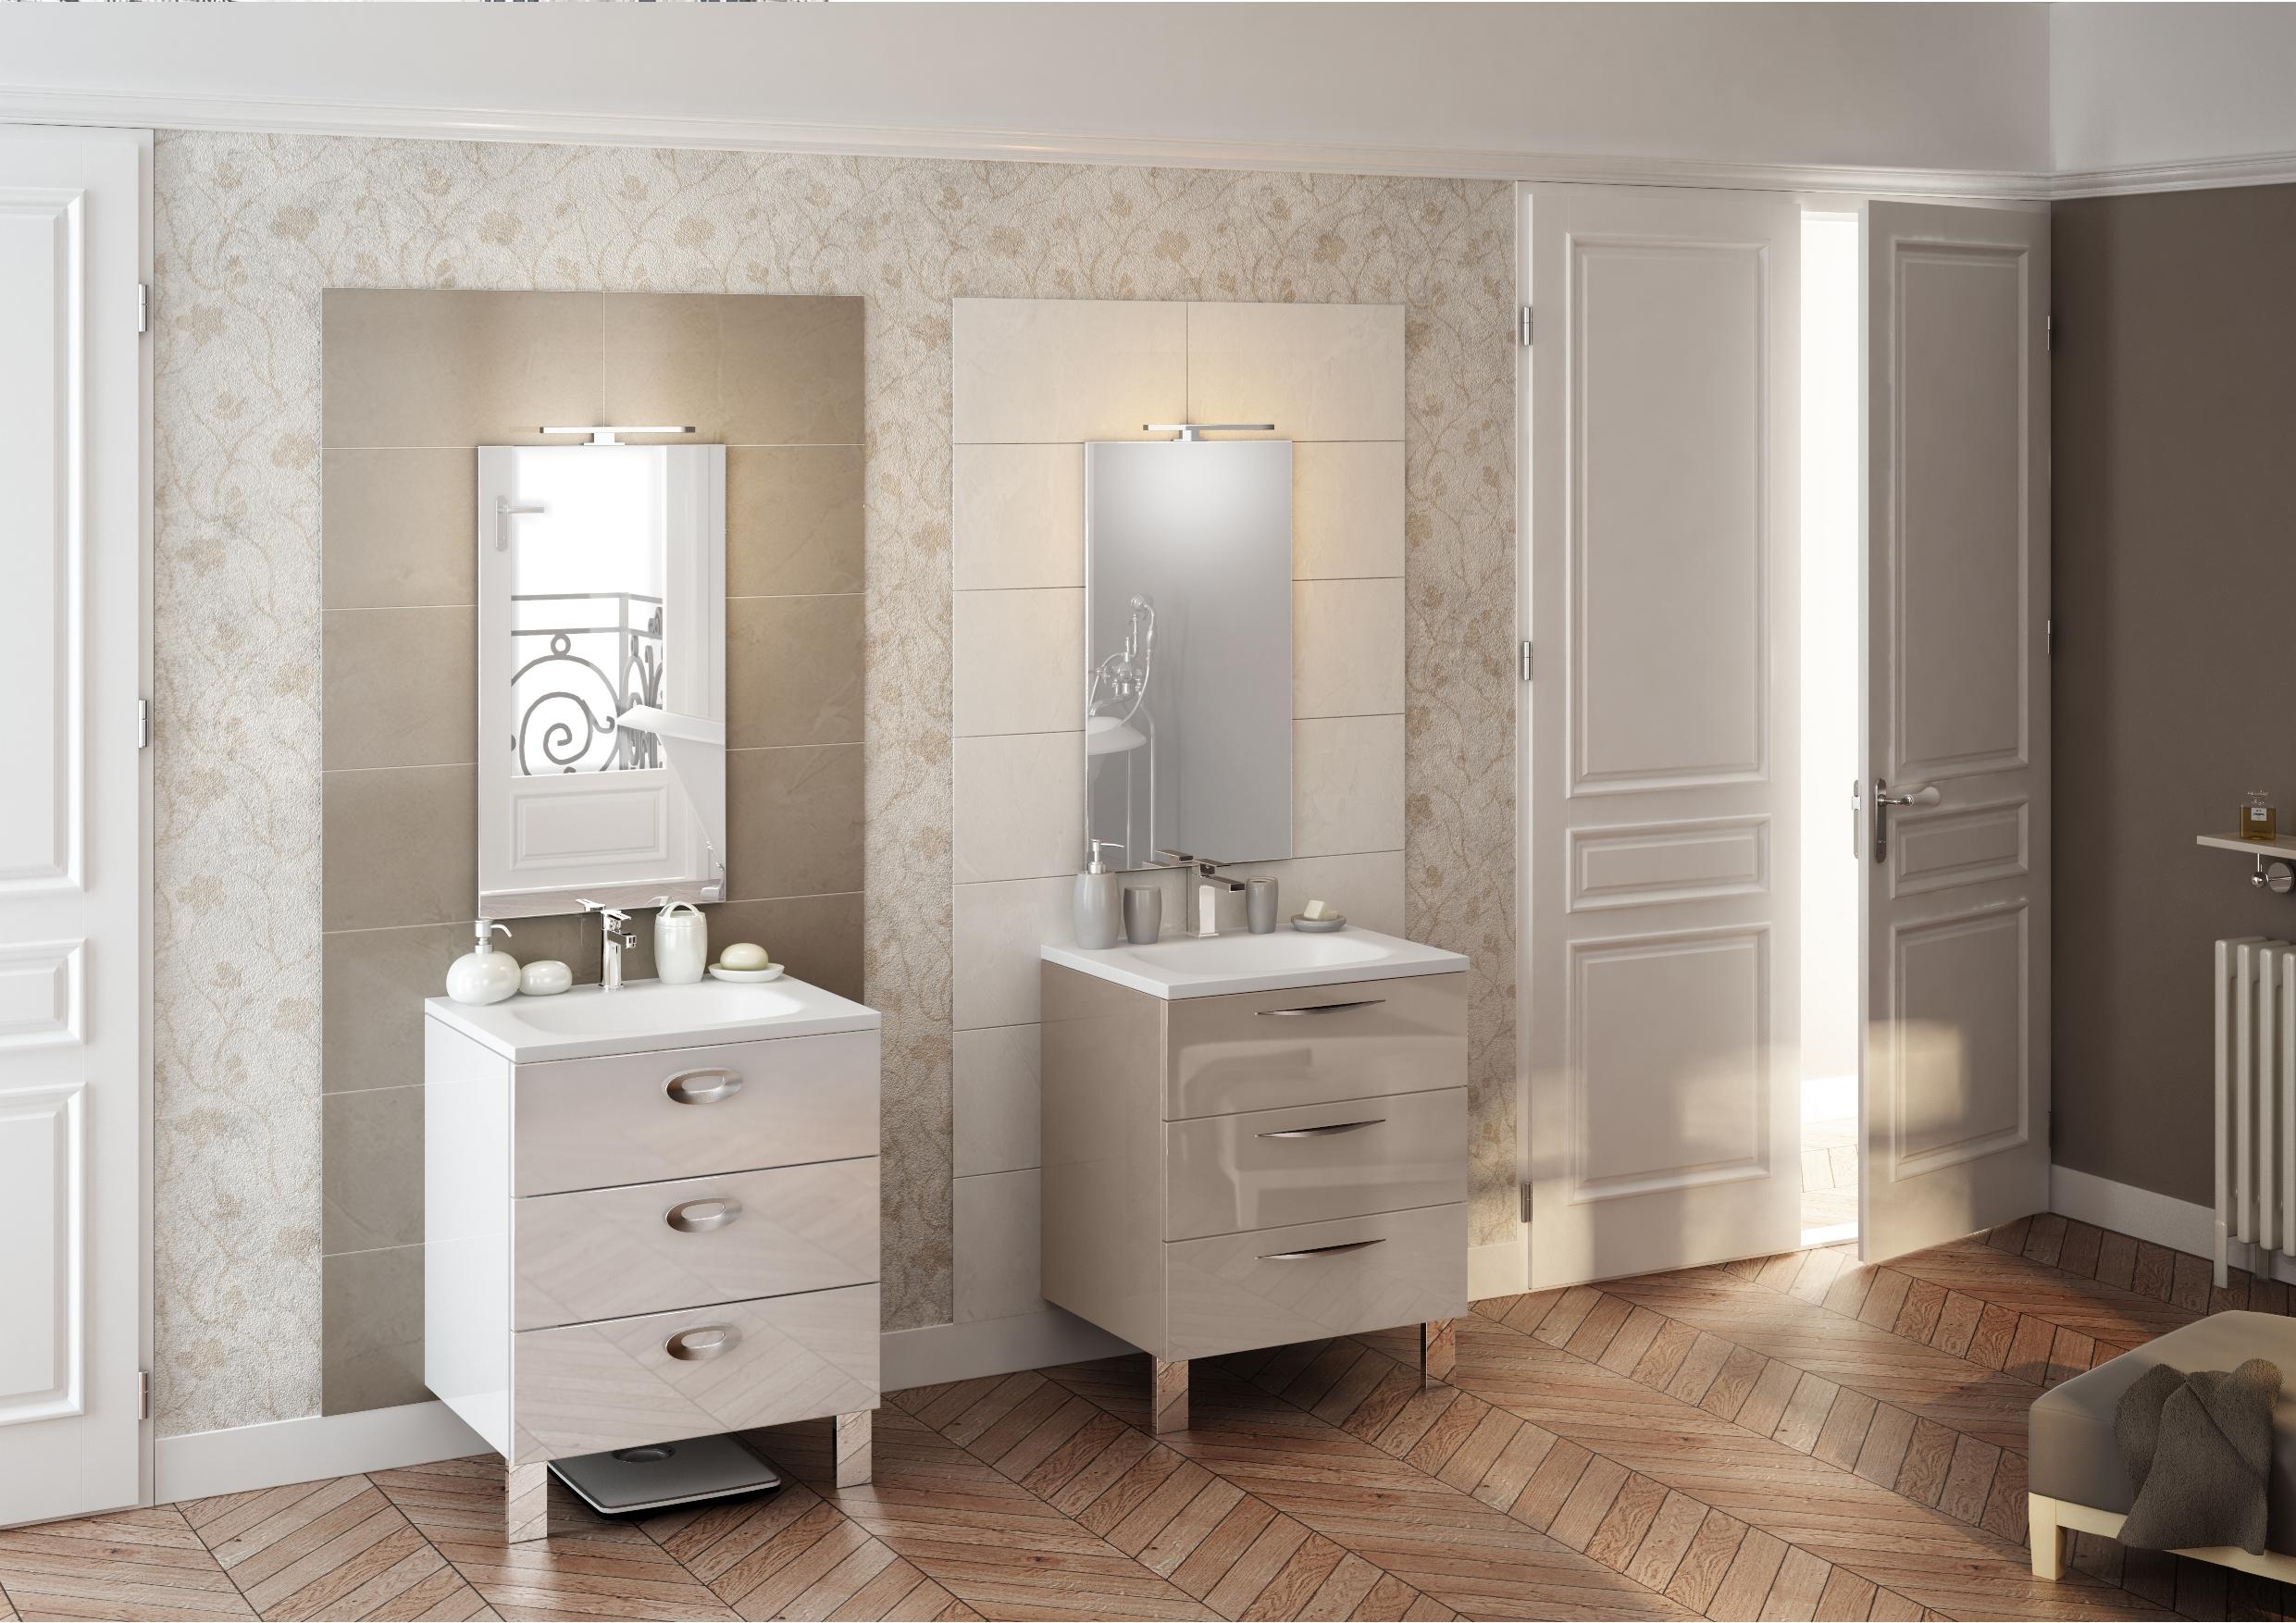 TRENDY - Cristal Blanc & Cristal Argile.